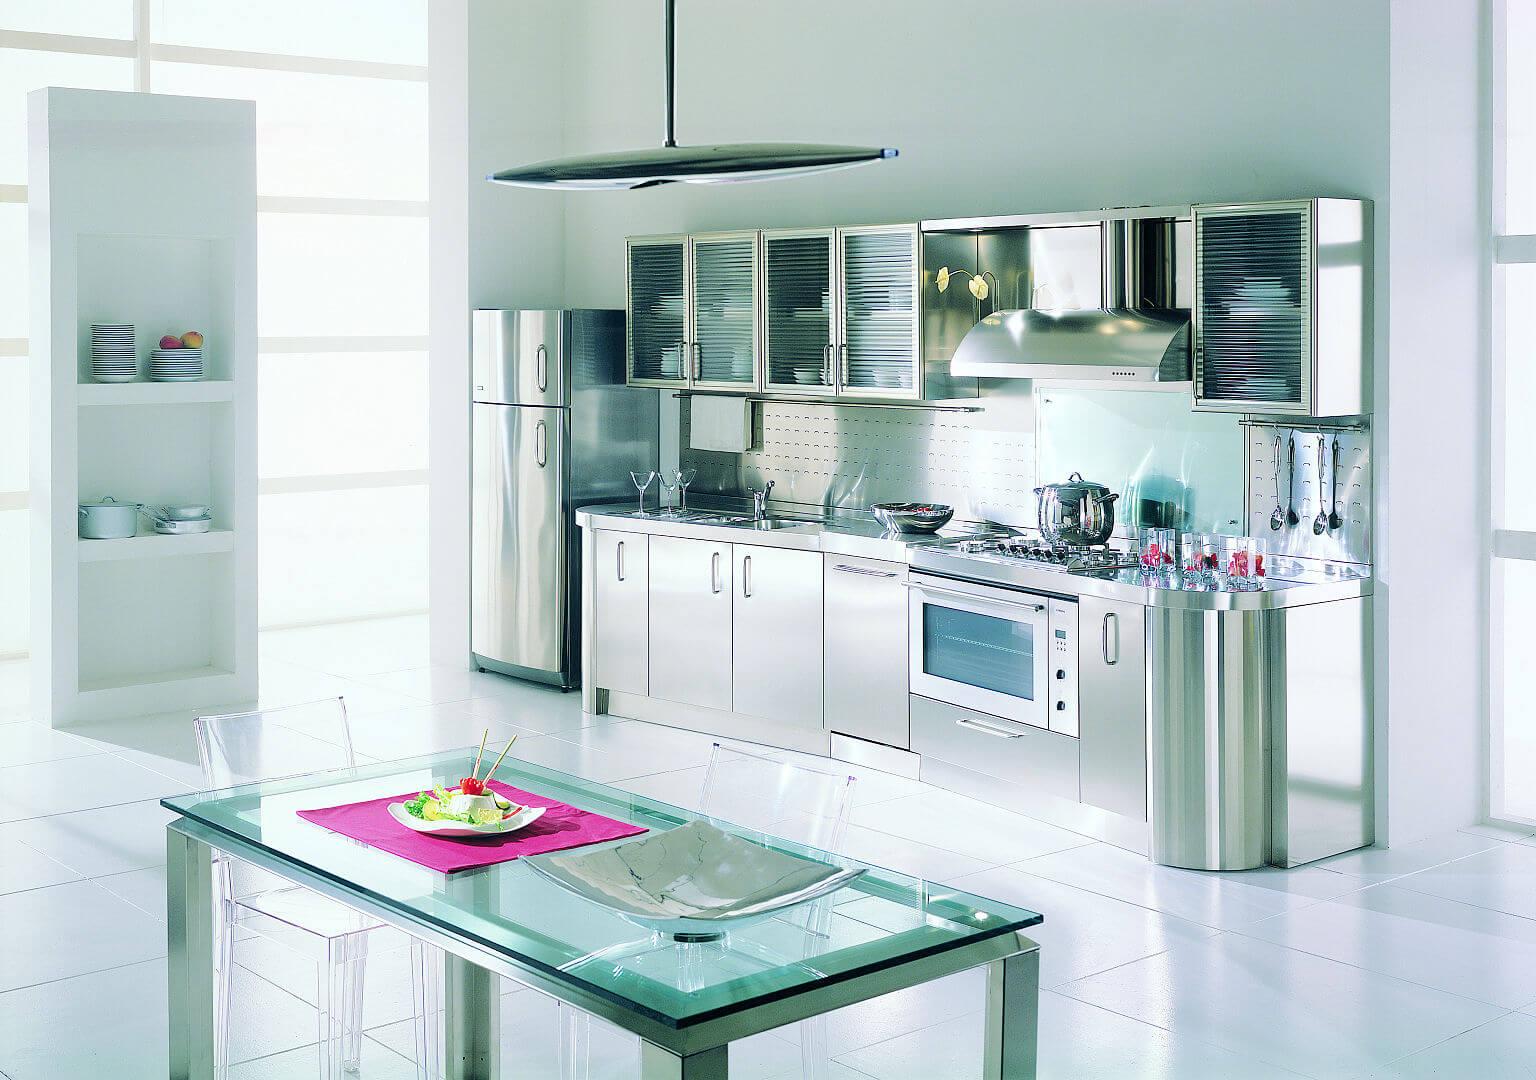 Cucine in acciaio inox prezzi cucine componibili in acciaio foto design mag cucine acciaio - Cucine in acciaio ikea ...